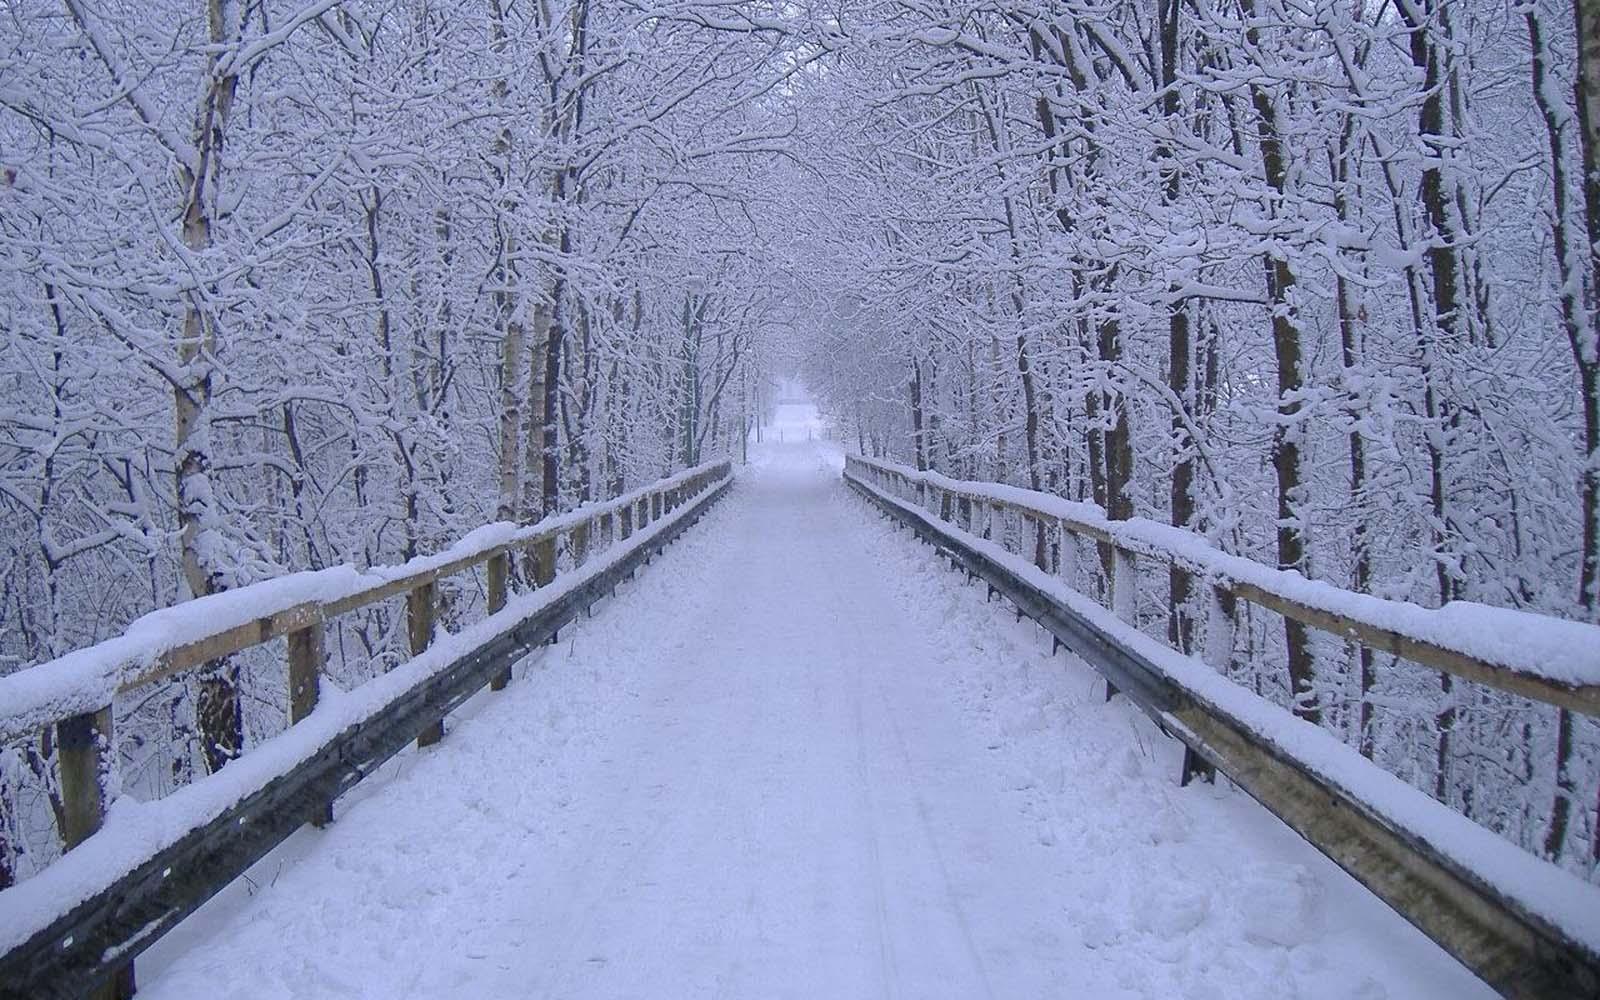 Wallpaper Of Winter Scenes 1600x1000 px 26193 Kb 1600x1000